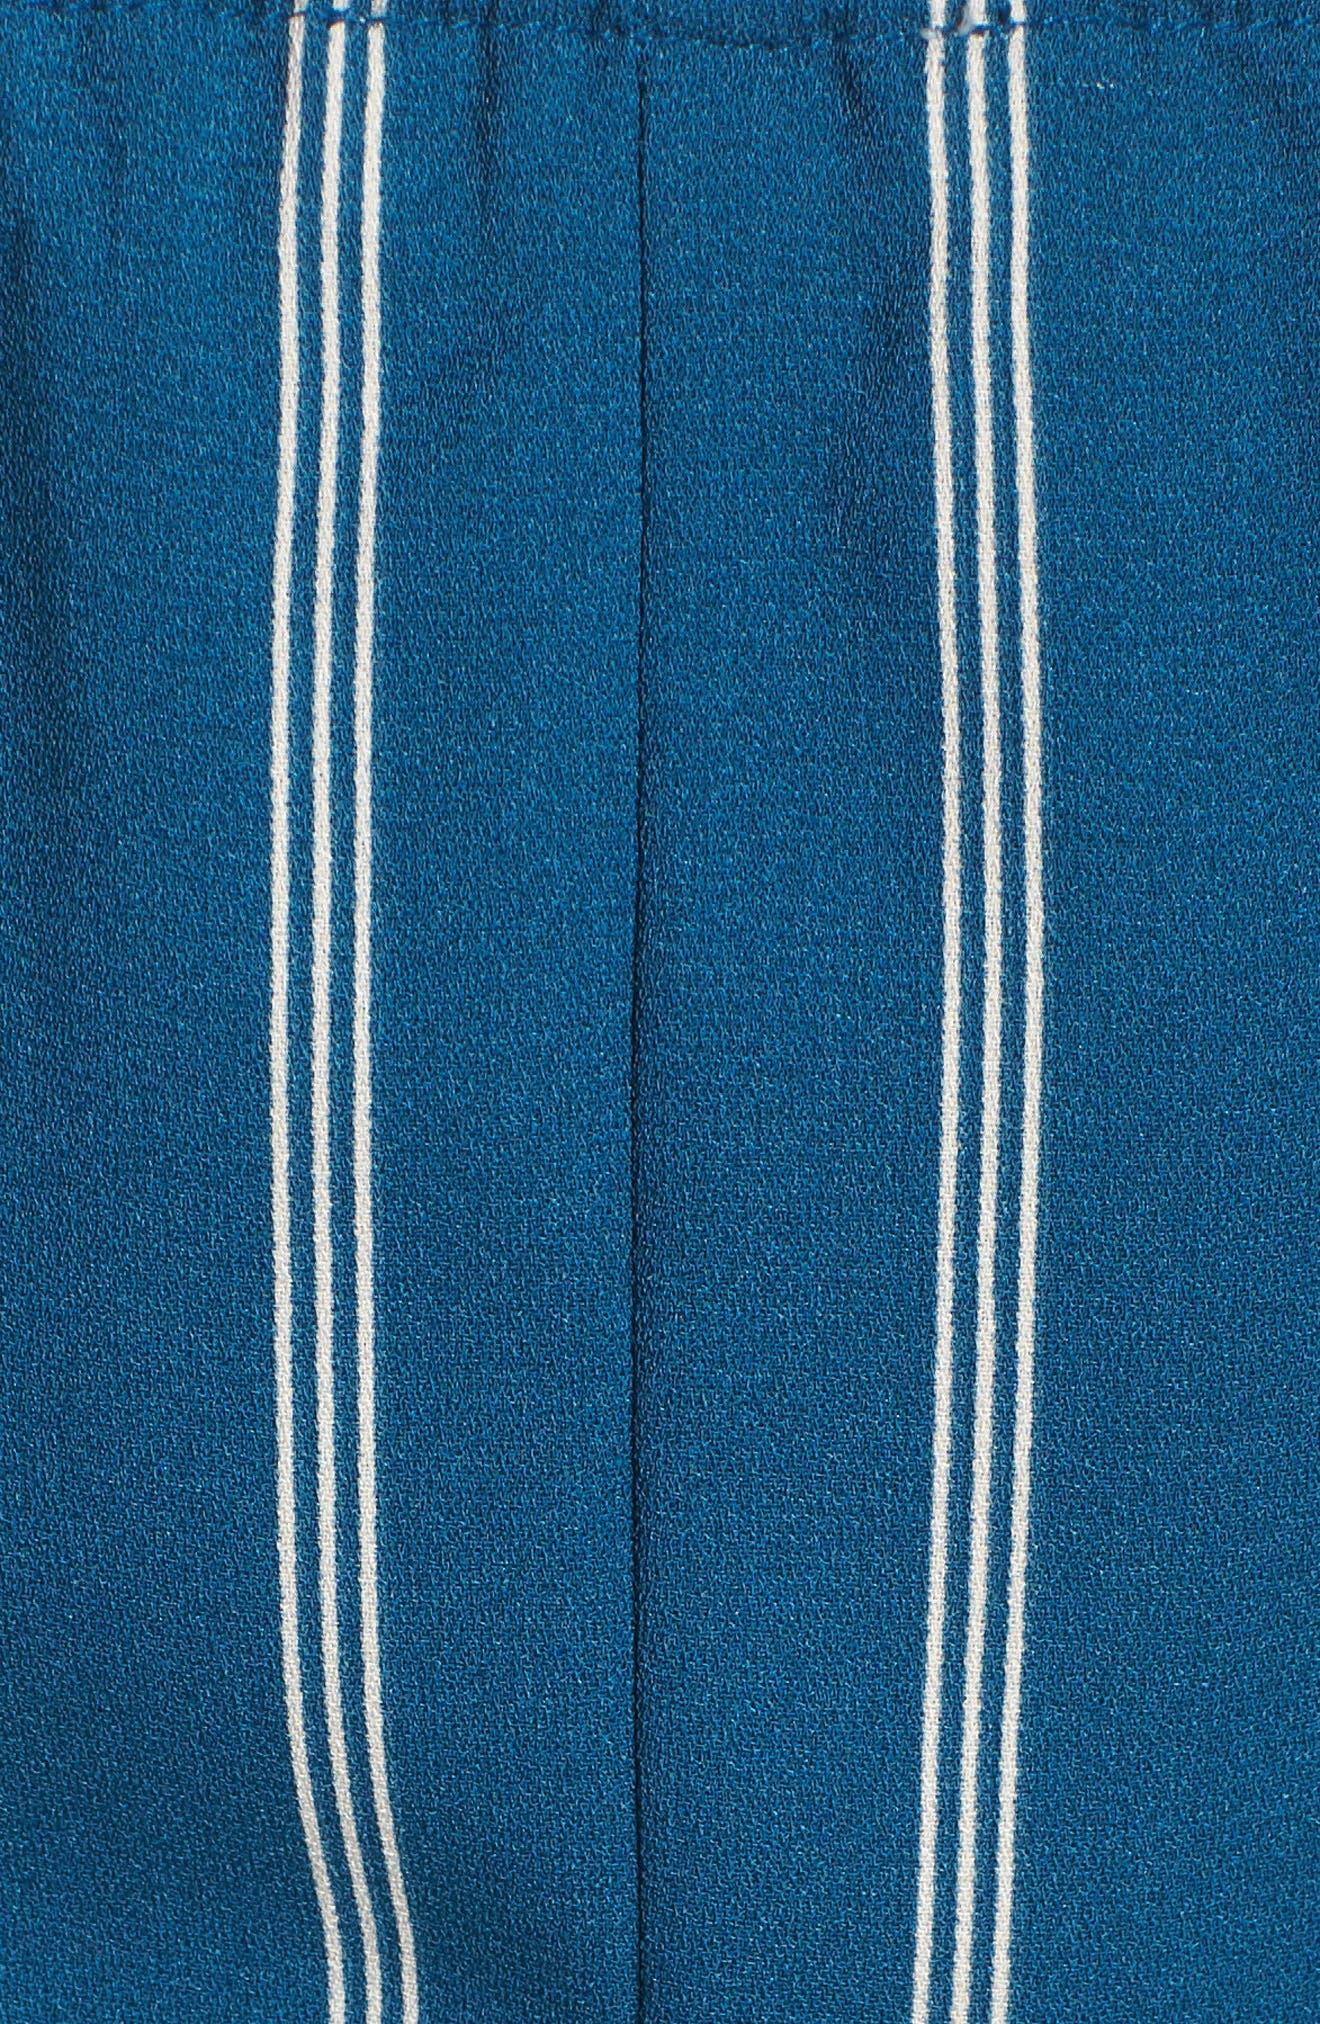 Cutout Culotte Jumpsuit,                             Alternate thumbnail 5, color,                             Teal Seagate Pinstripe